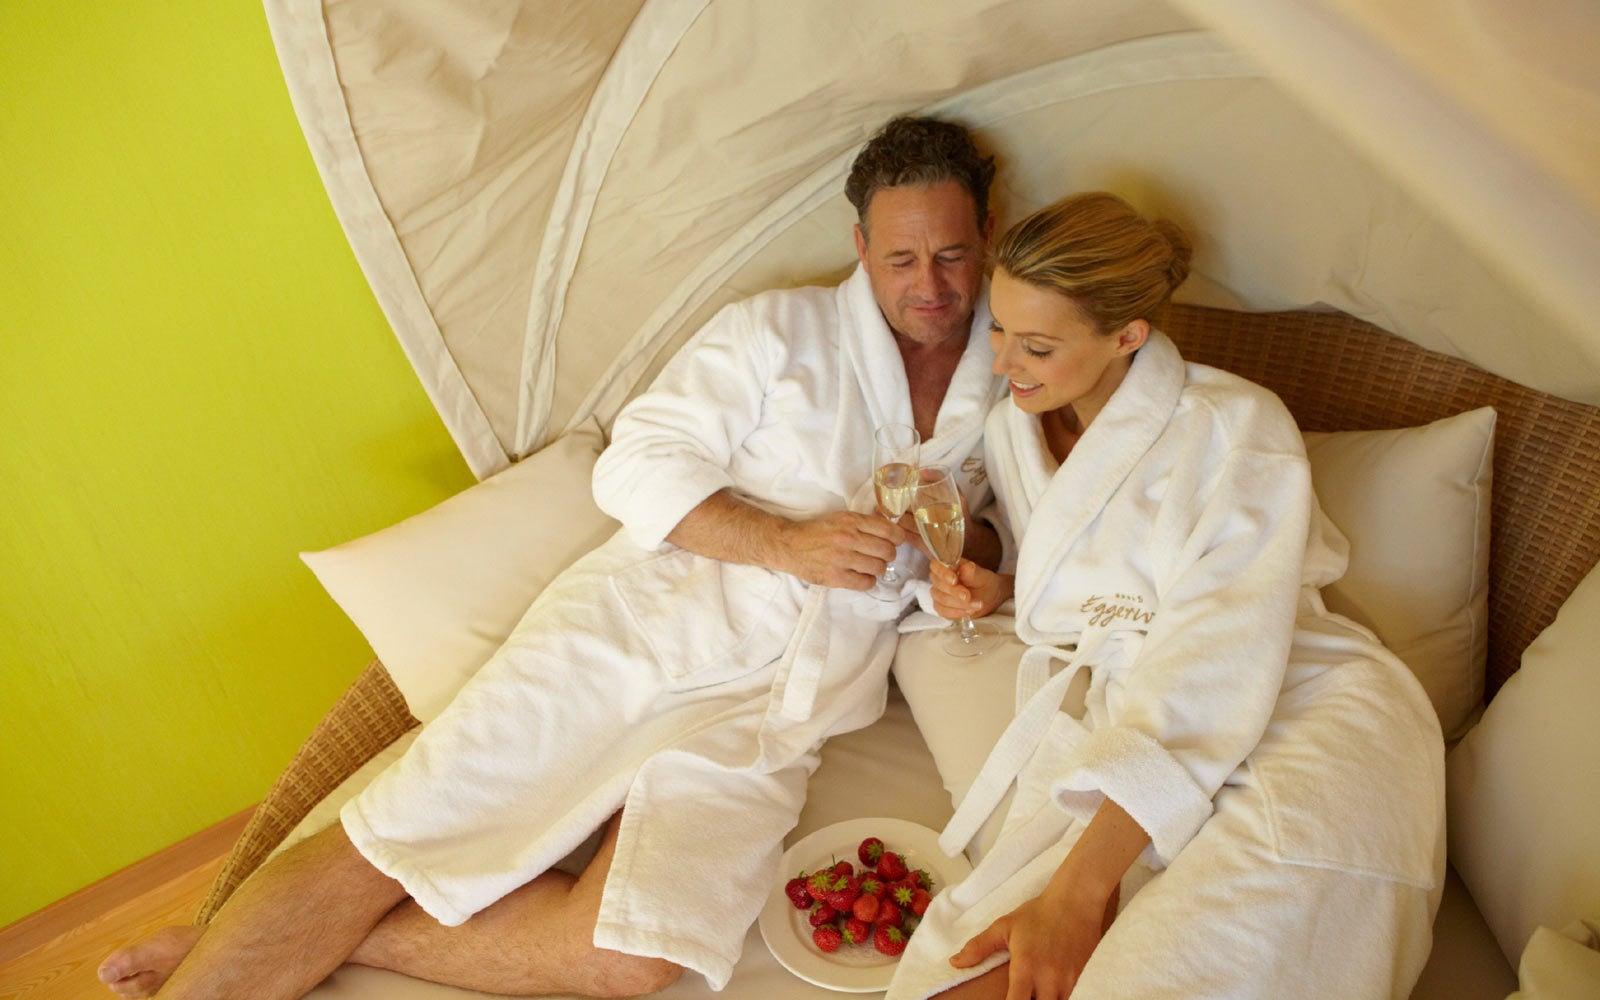 Relaxation for body & spirit